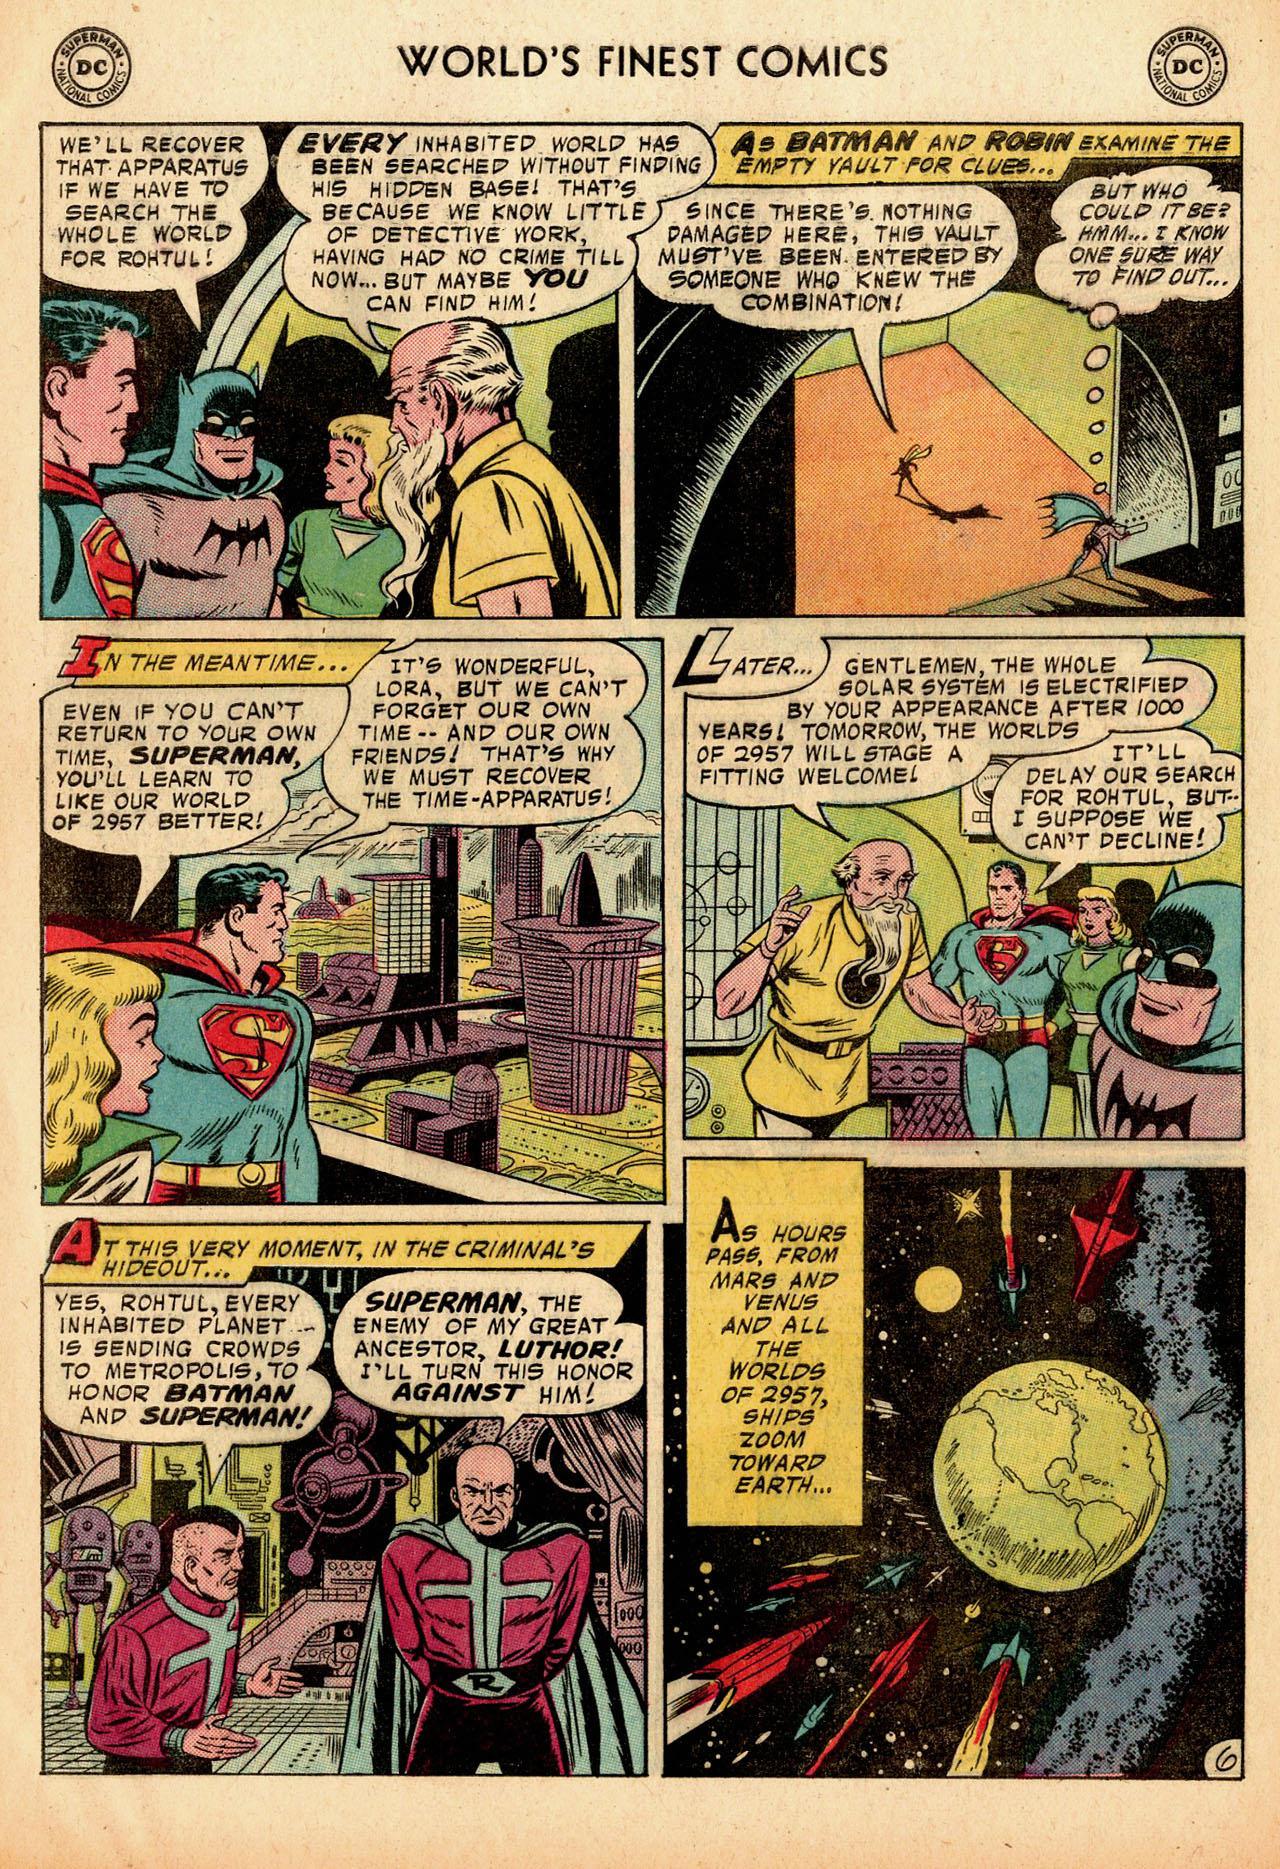 Read online World's Finest Comics comic -  Issue #91 - 8